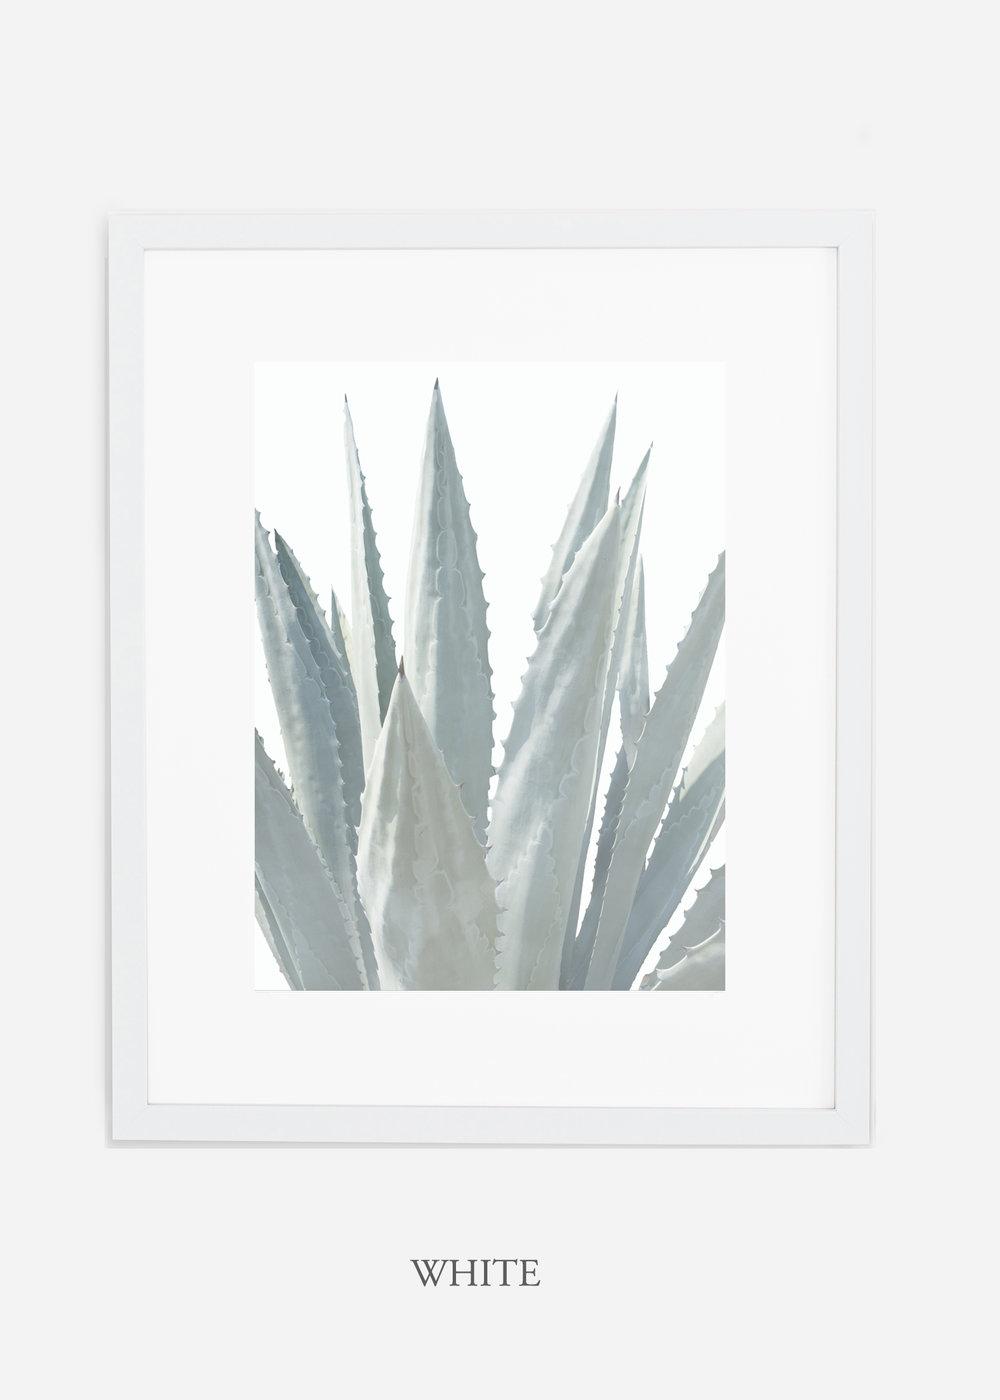 winterwhite_whiteframe_WinterWhiteAgaveNo.3_agave_prints_interiordesign_art_homedecor_bohemian_modern_minimal_photography_cactusphotography.jpg